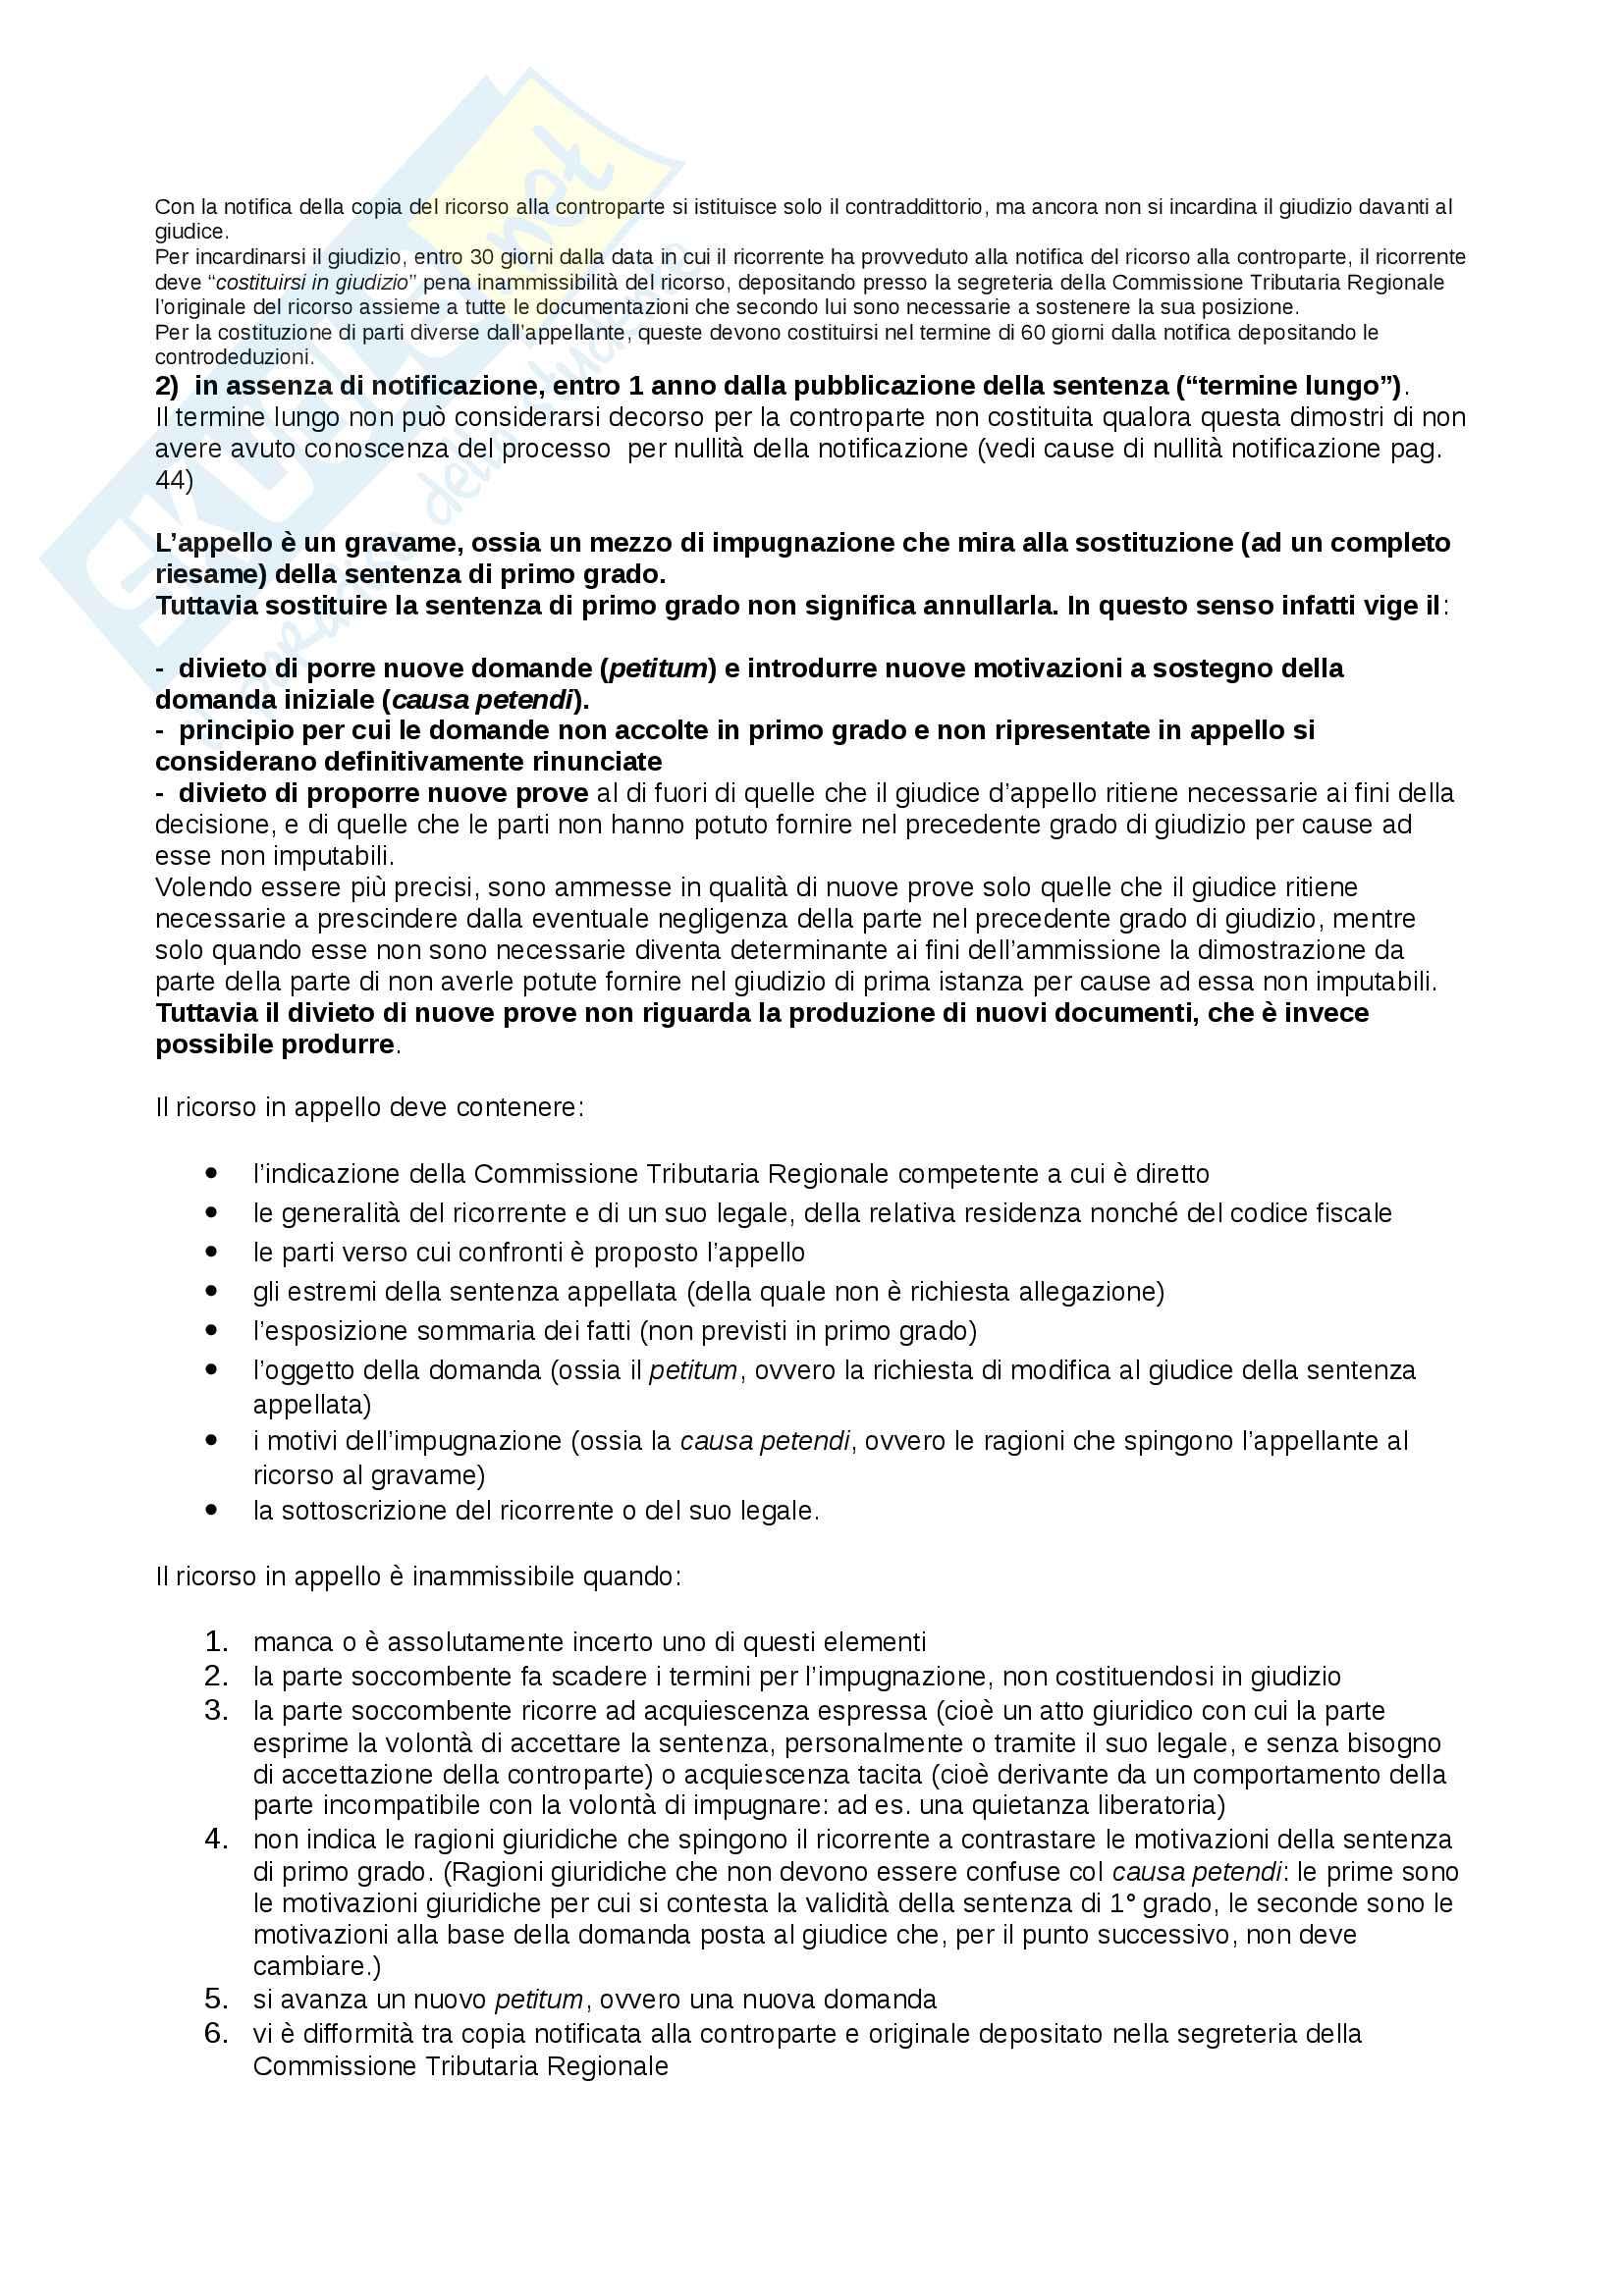 Appunti Diritto tributario d'impresa, prof. Giorgi Pag. 51